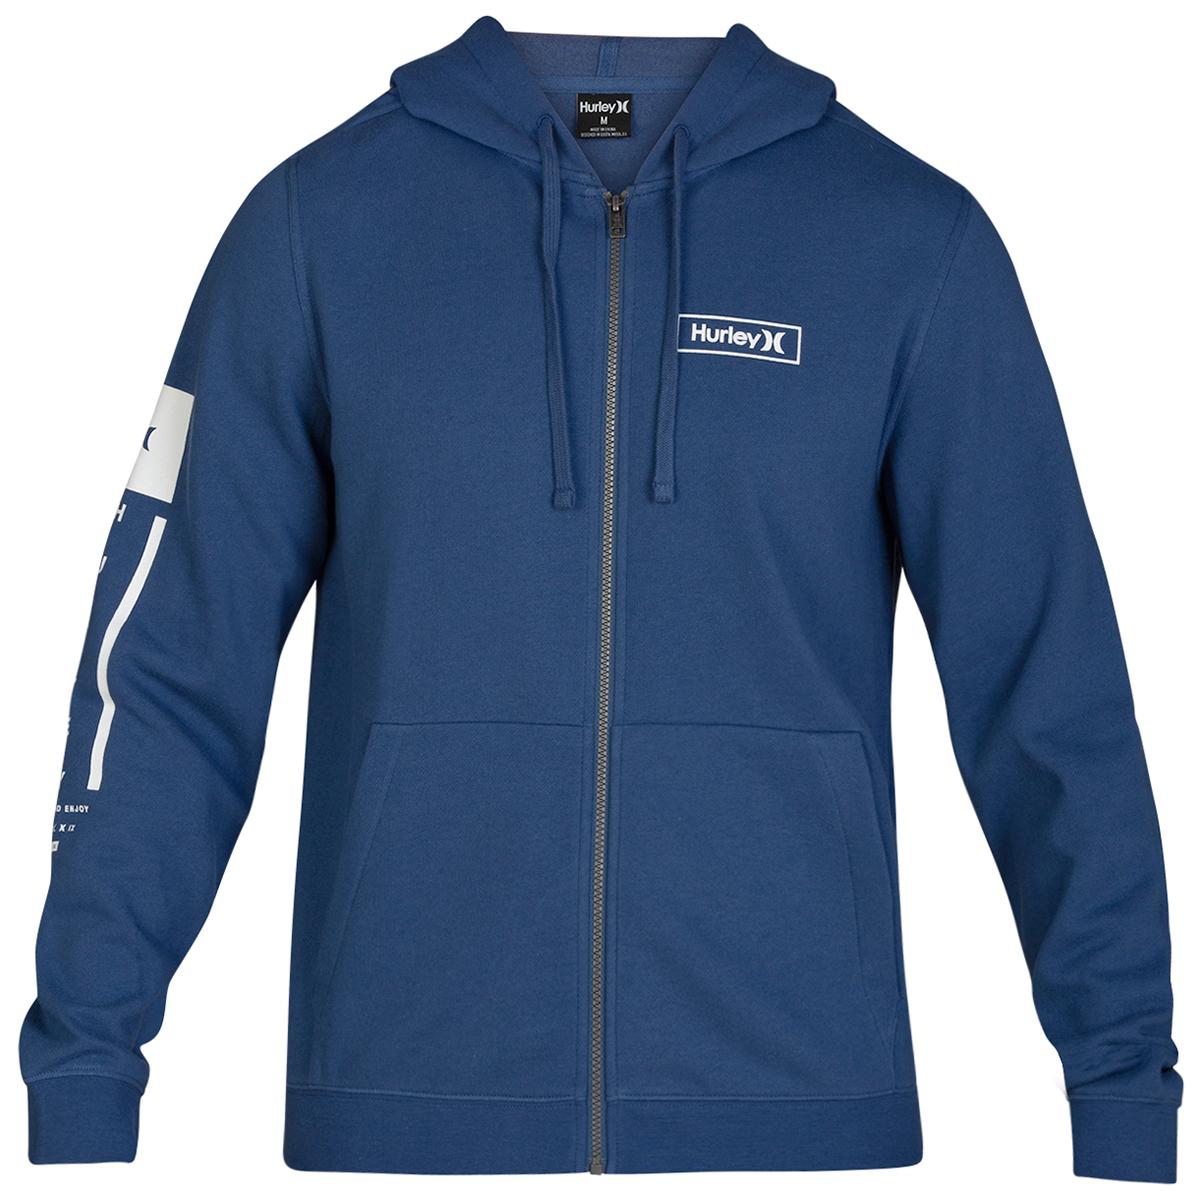 Hurley Men's Right Arm Full-Zip Jacket - Blue, L